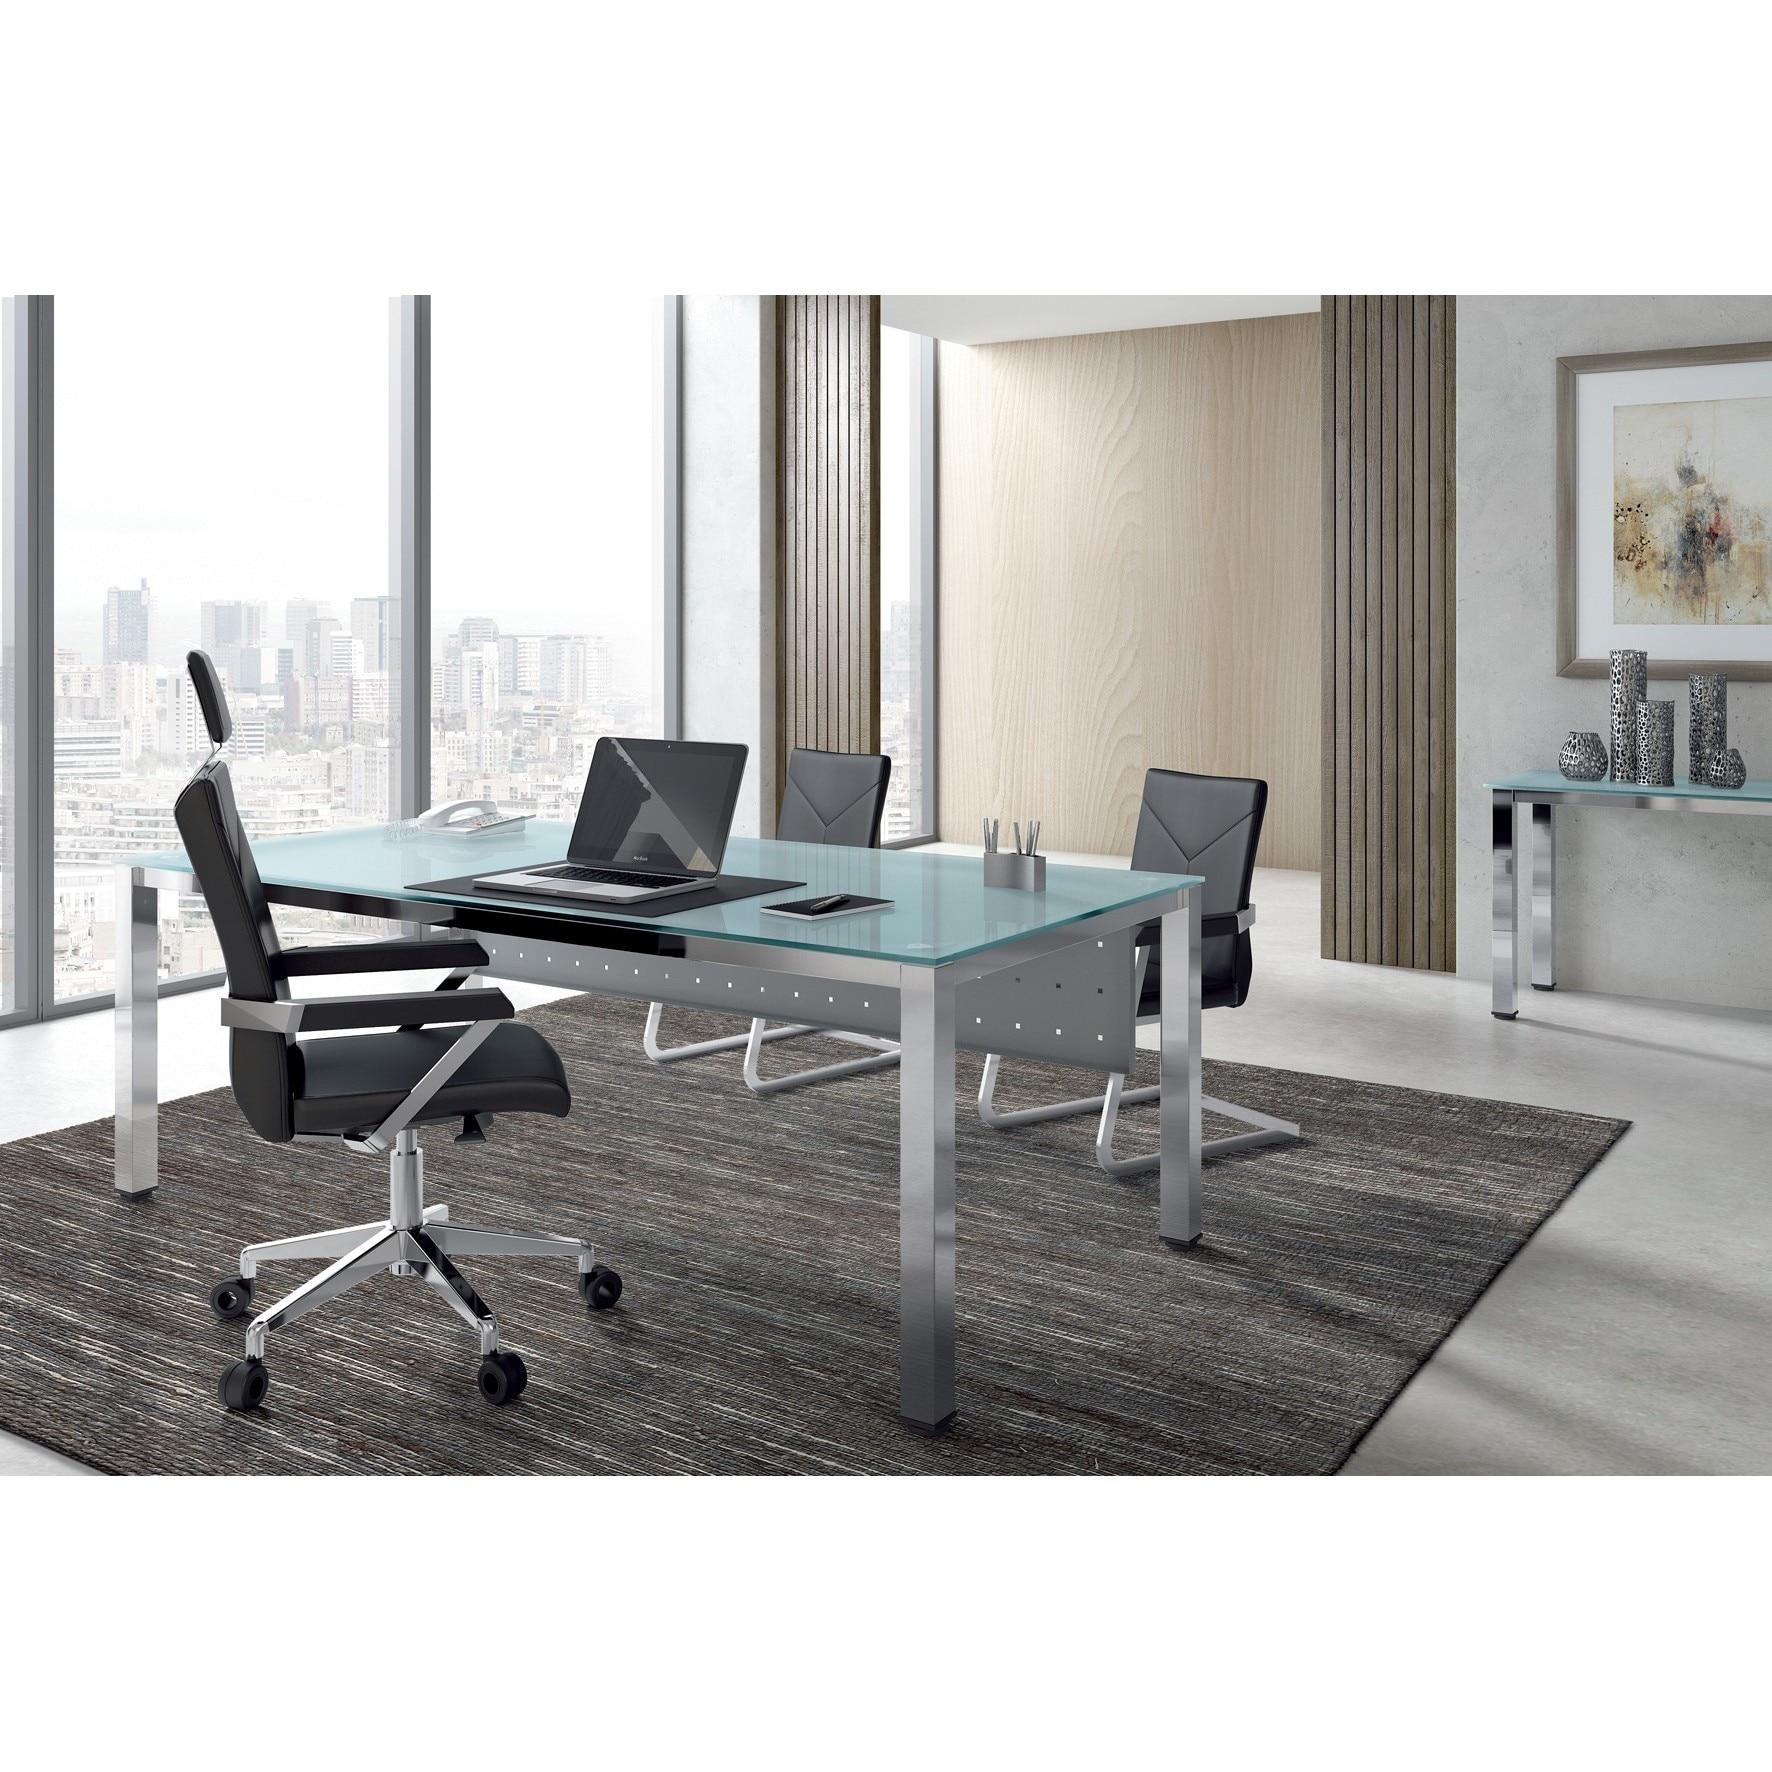 TABLE OFFICE 'S EXECUTIVE SERIES 200X100 ALUMINUM/CRYSTAL